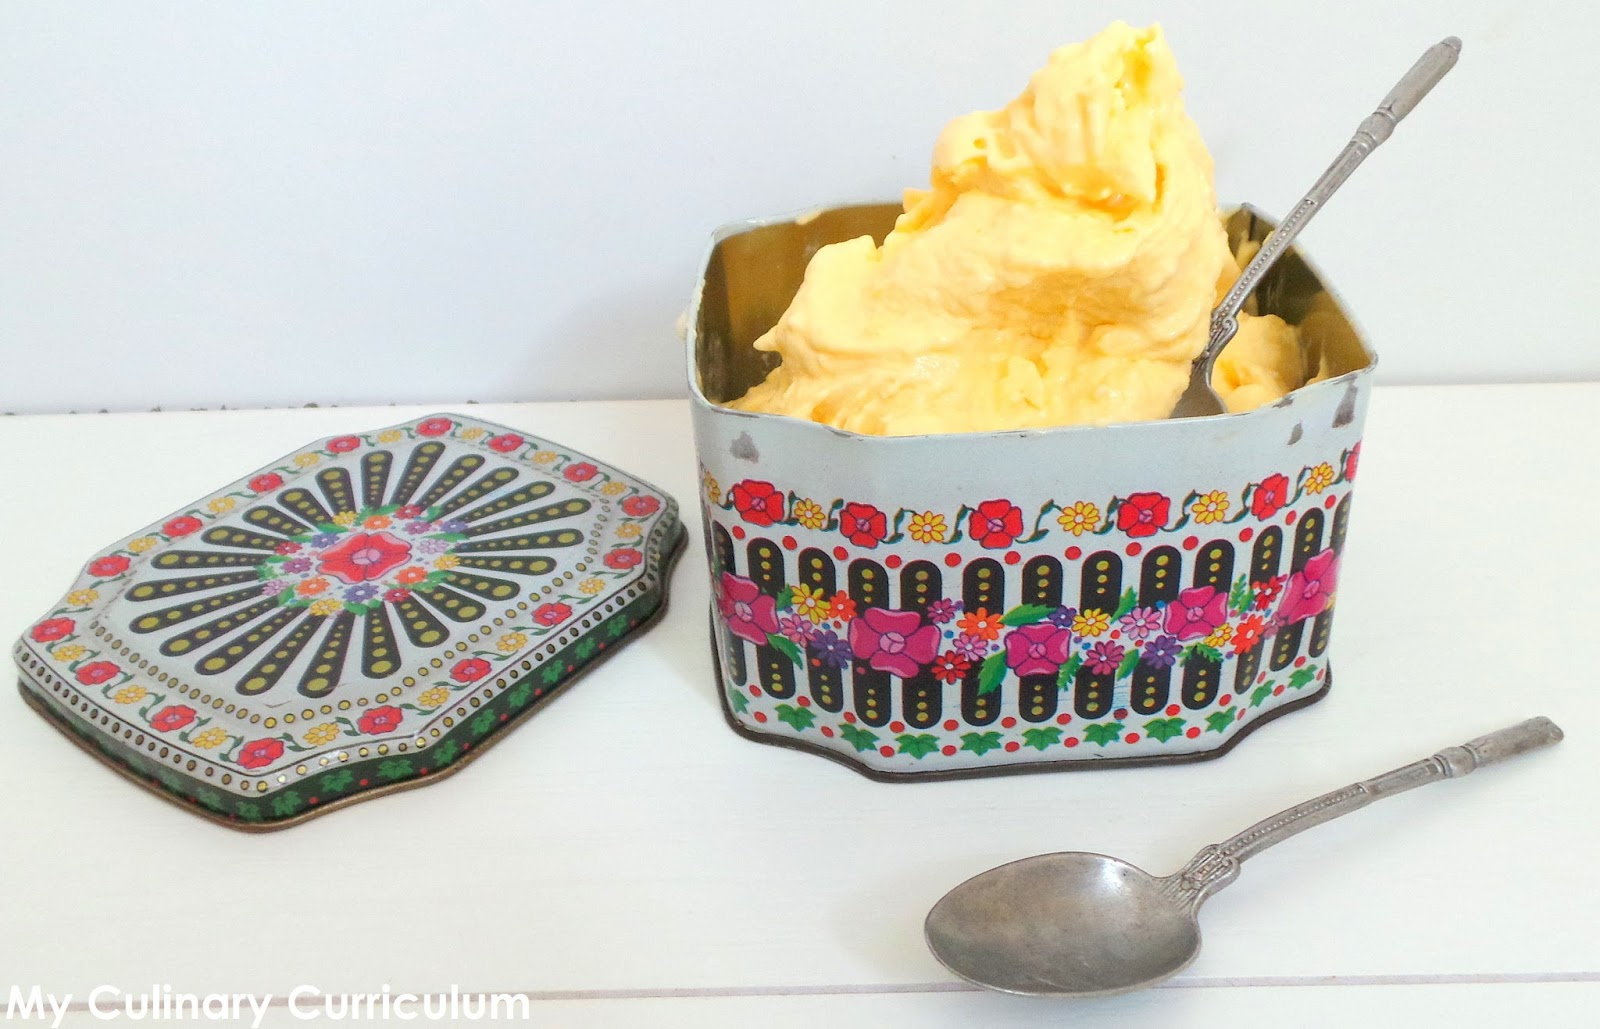 my culinary curriculum  glace mangue et yaourt  mango and